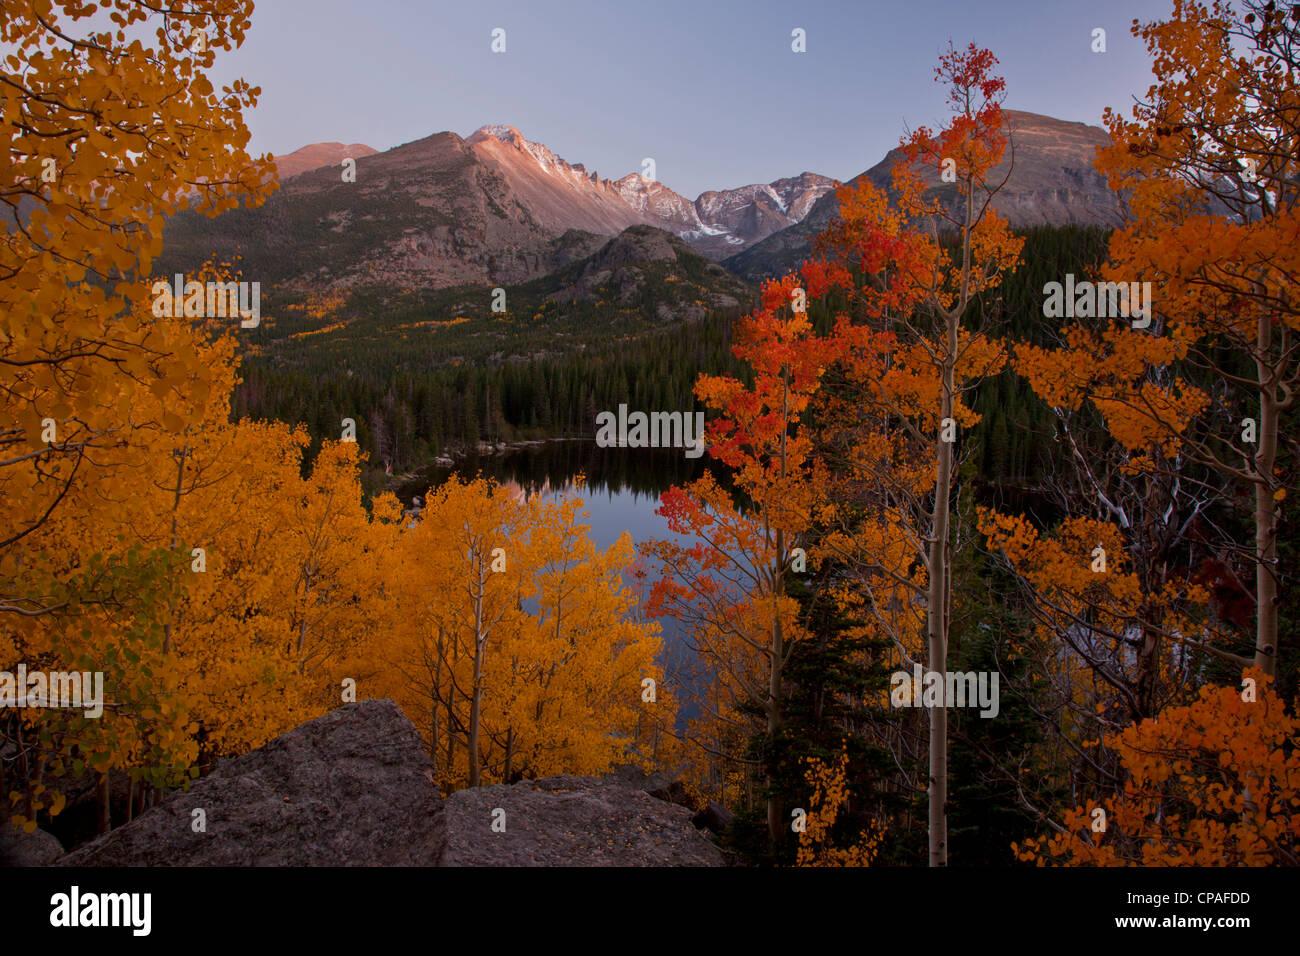 USA, Colorado, Rocky Mountain National Park. Aspen trees in autumn foliage   frame Longs Peak above Bear Lake at - Stock Image